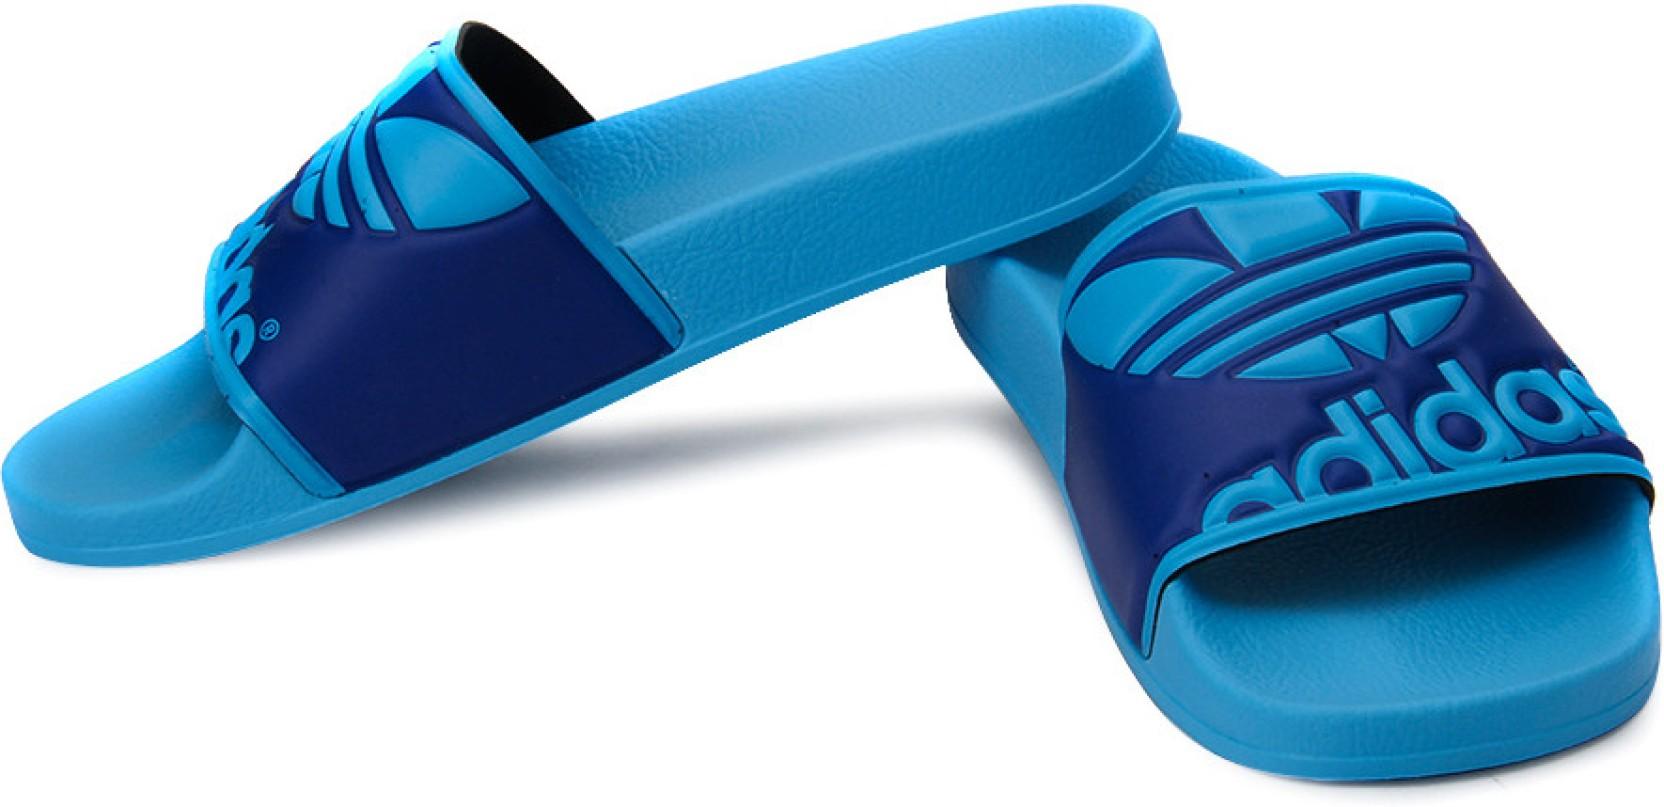 Adidas Originals Adilette Trefoil Flip Flops Buy Blue Color Sendal Original Home